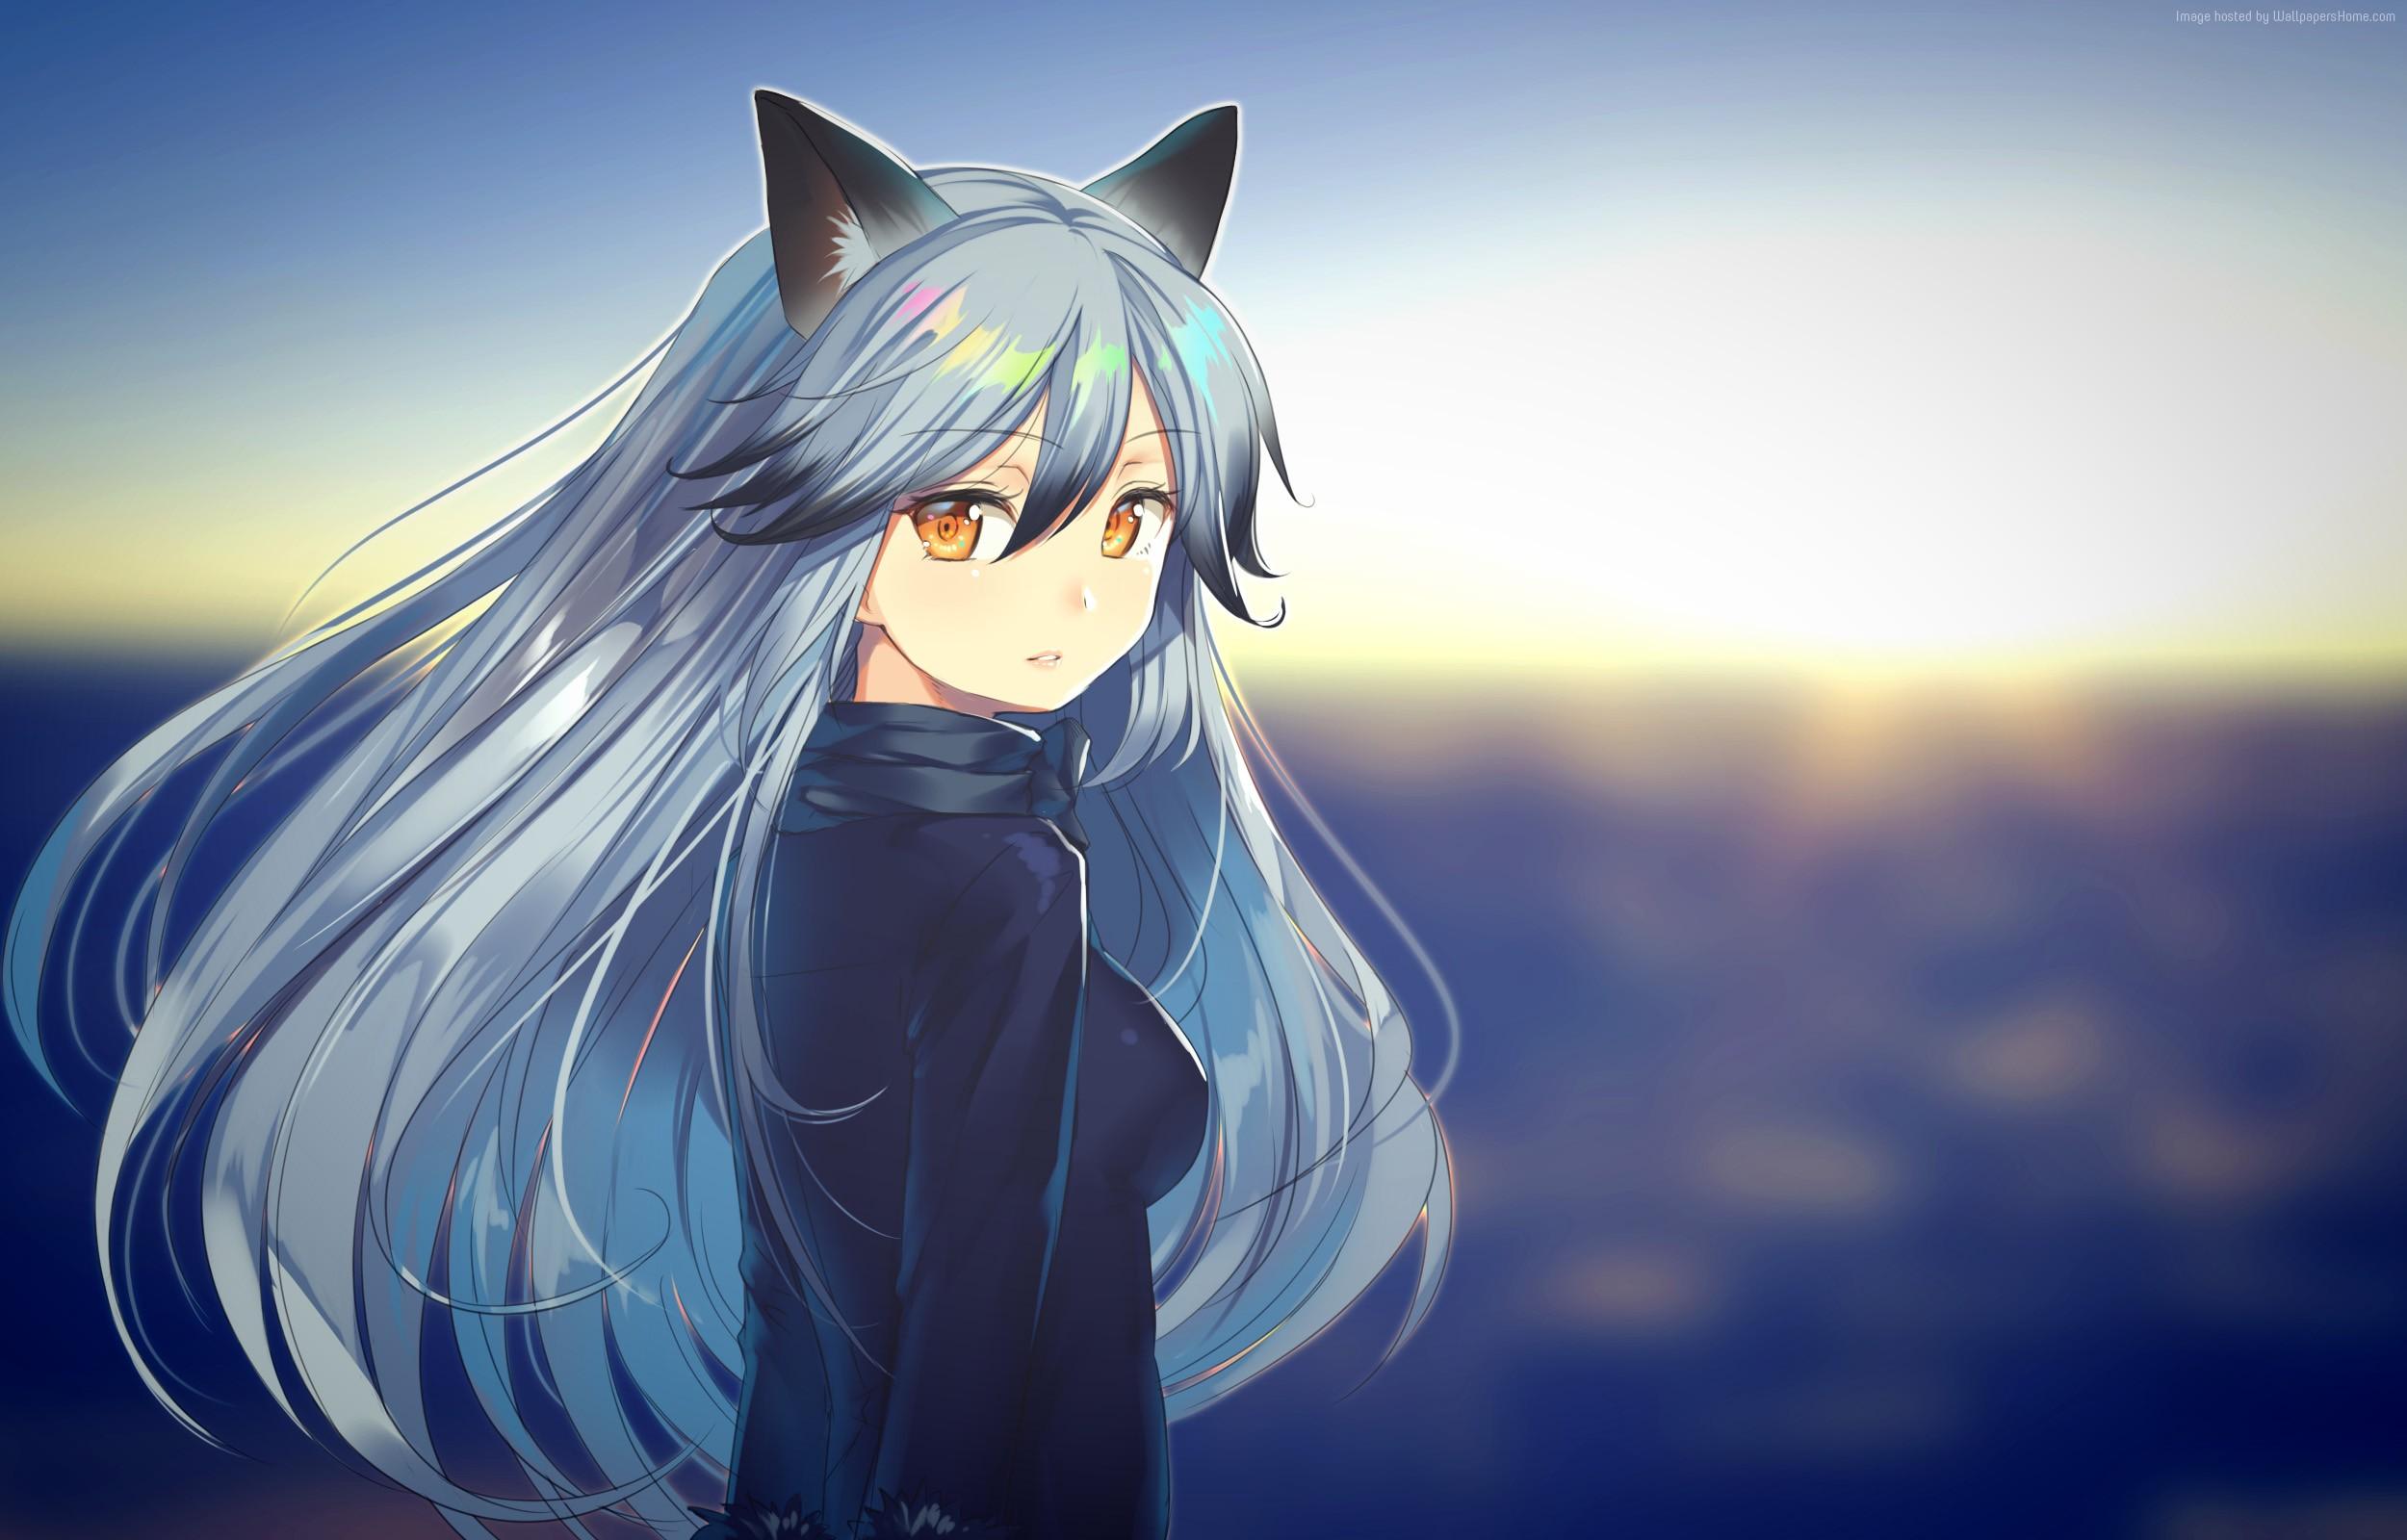 Wallpaper Anime Girls Kemono Friends Silver Fox Kemono